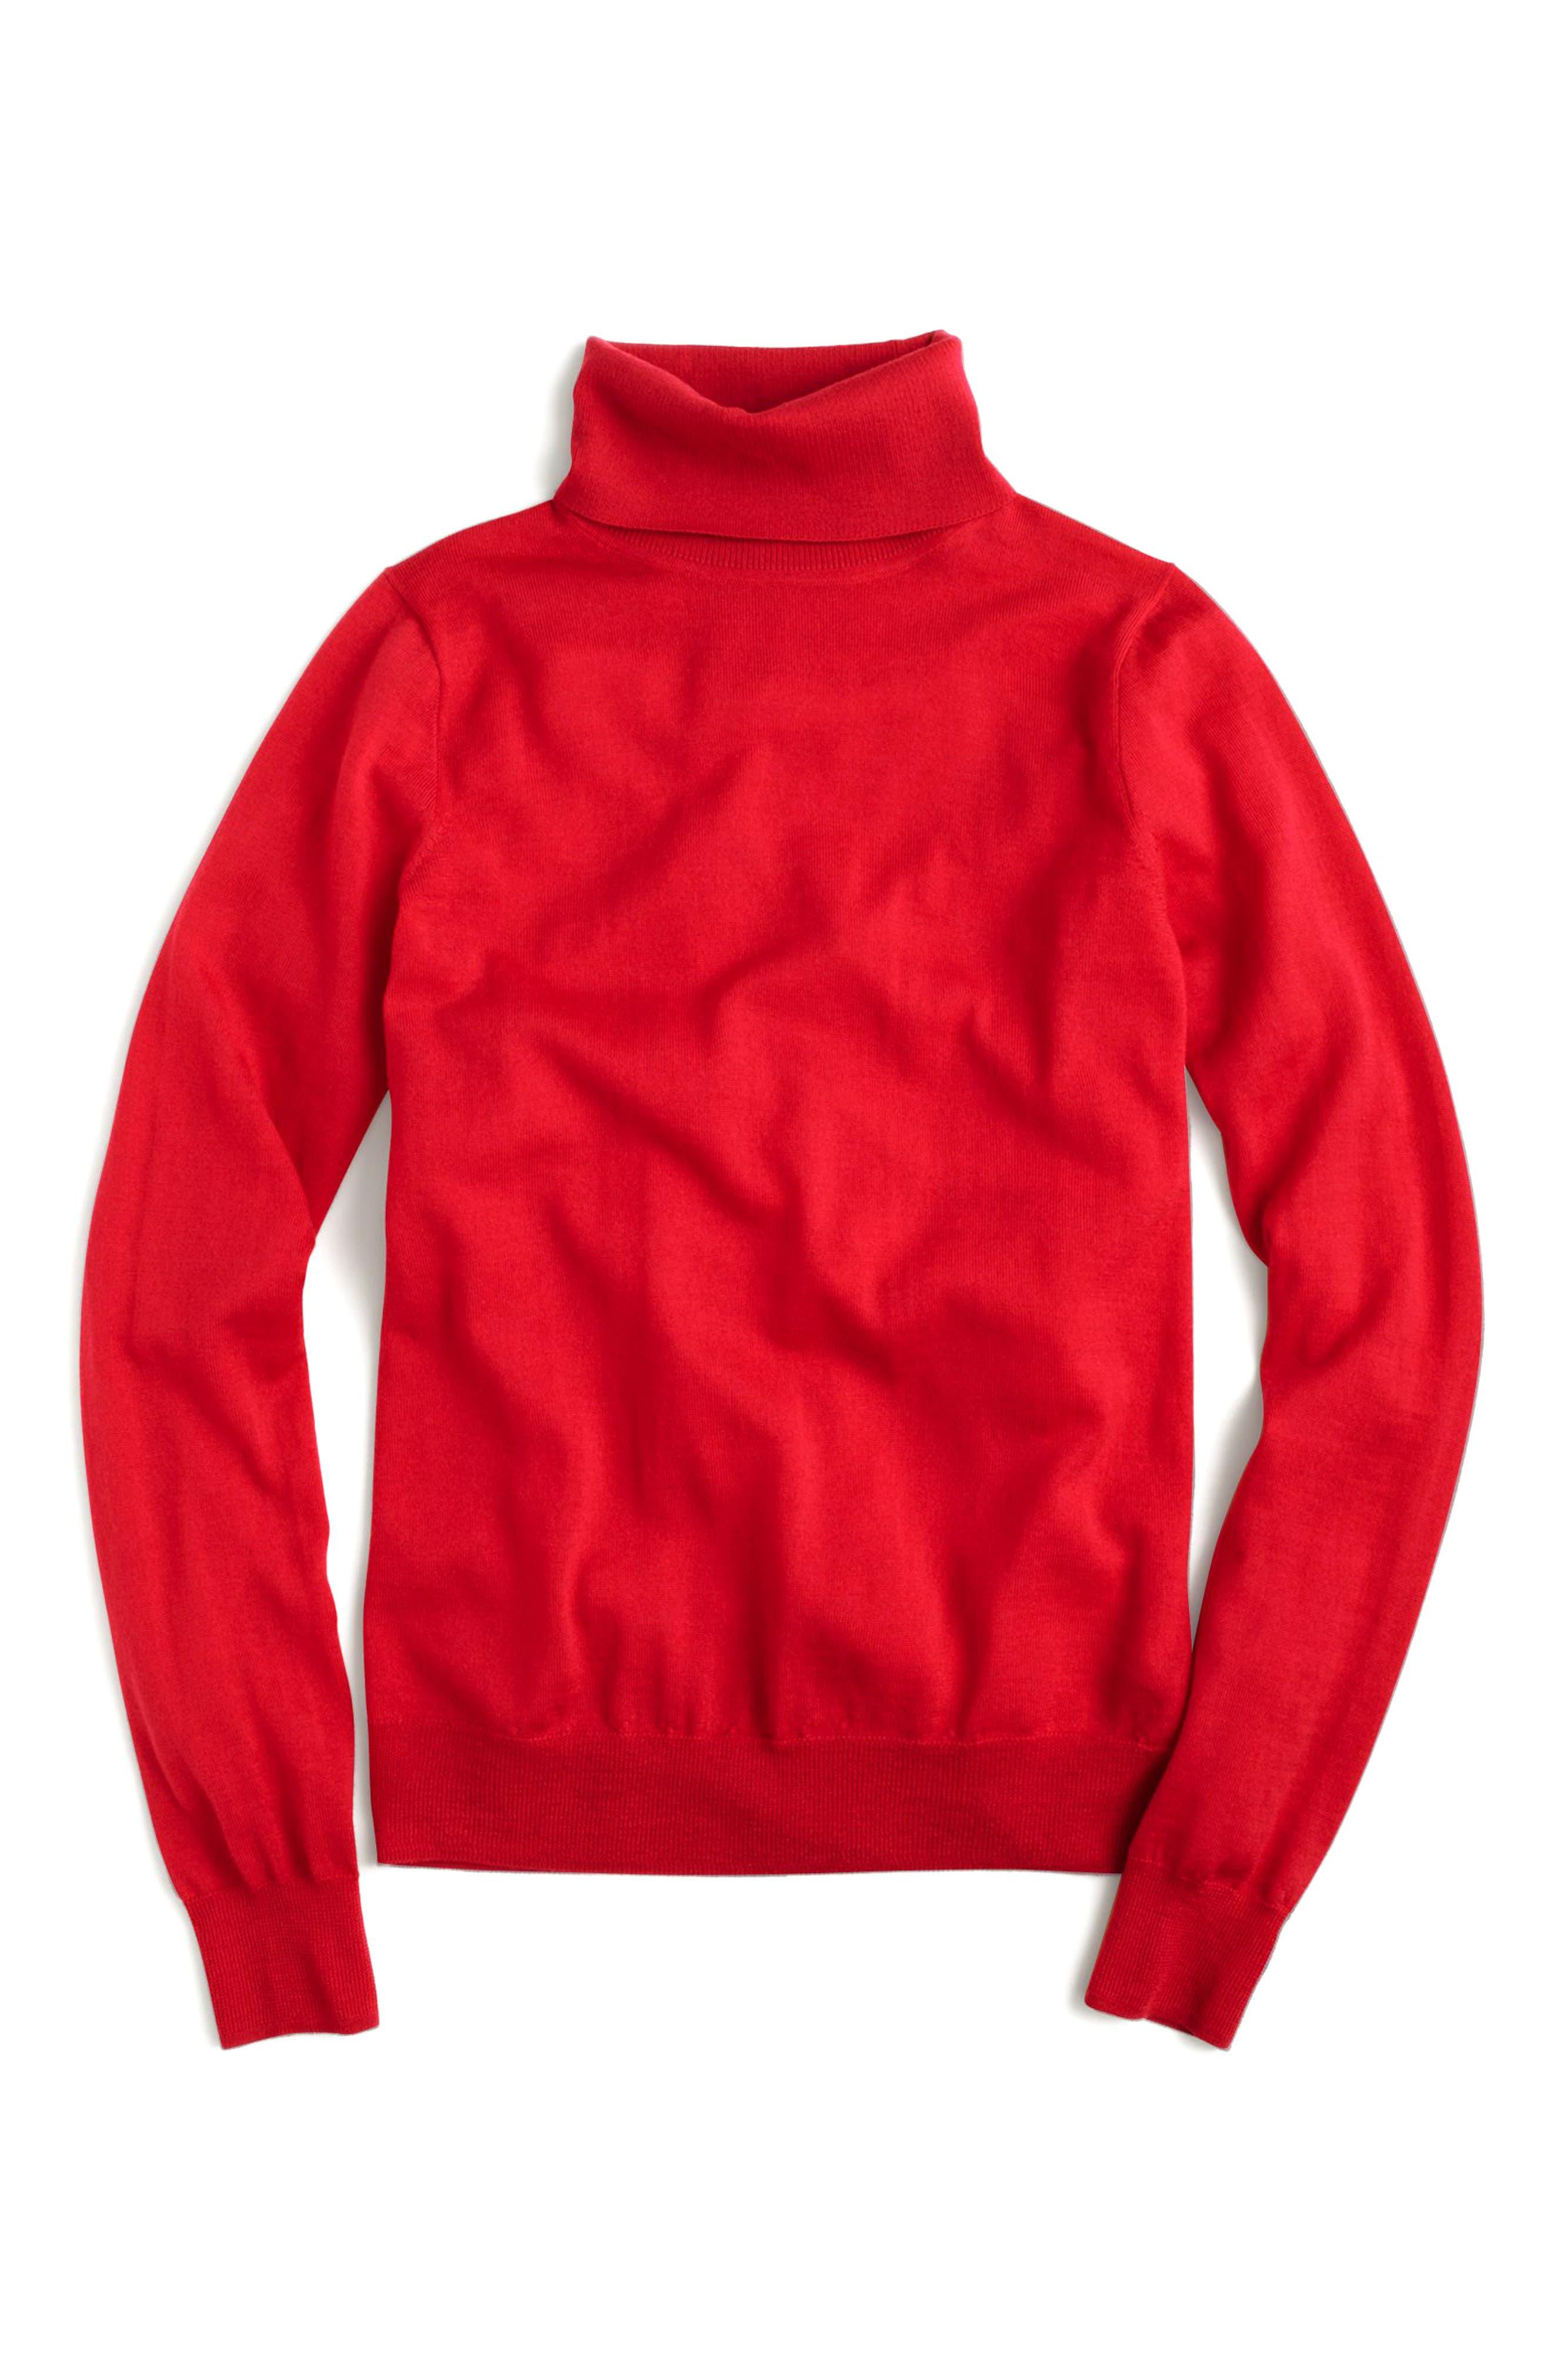 Main Image - J.Crew Tippi Turtleneck Sweater